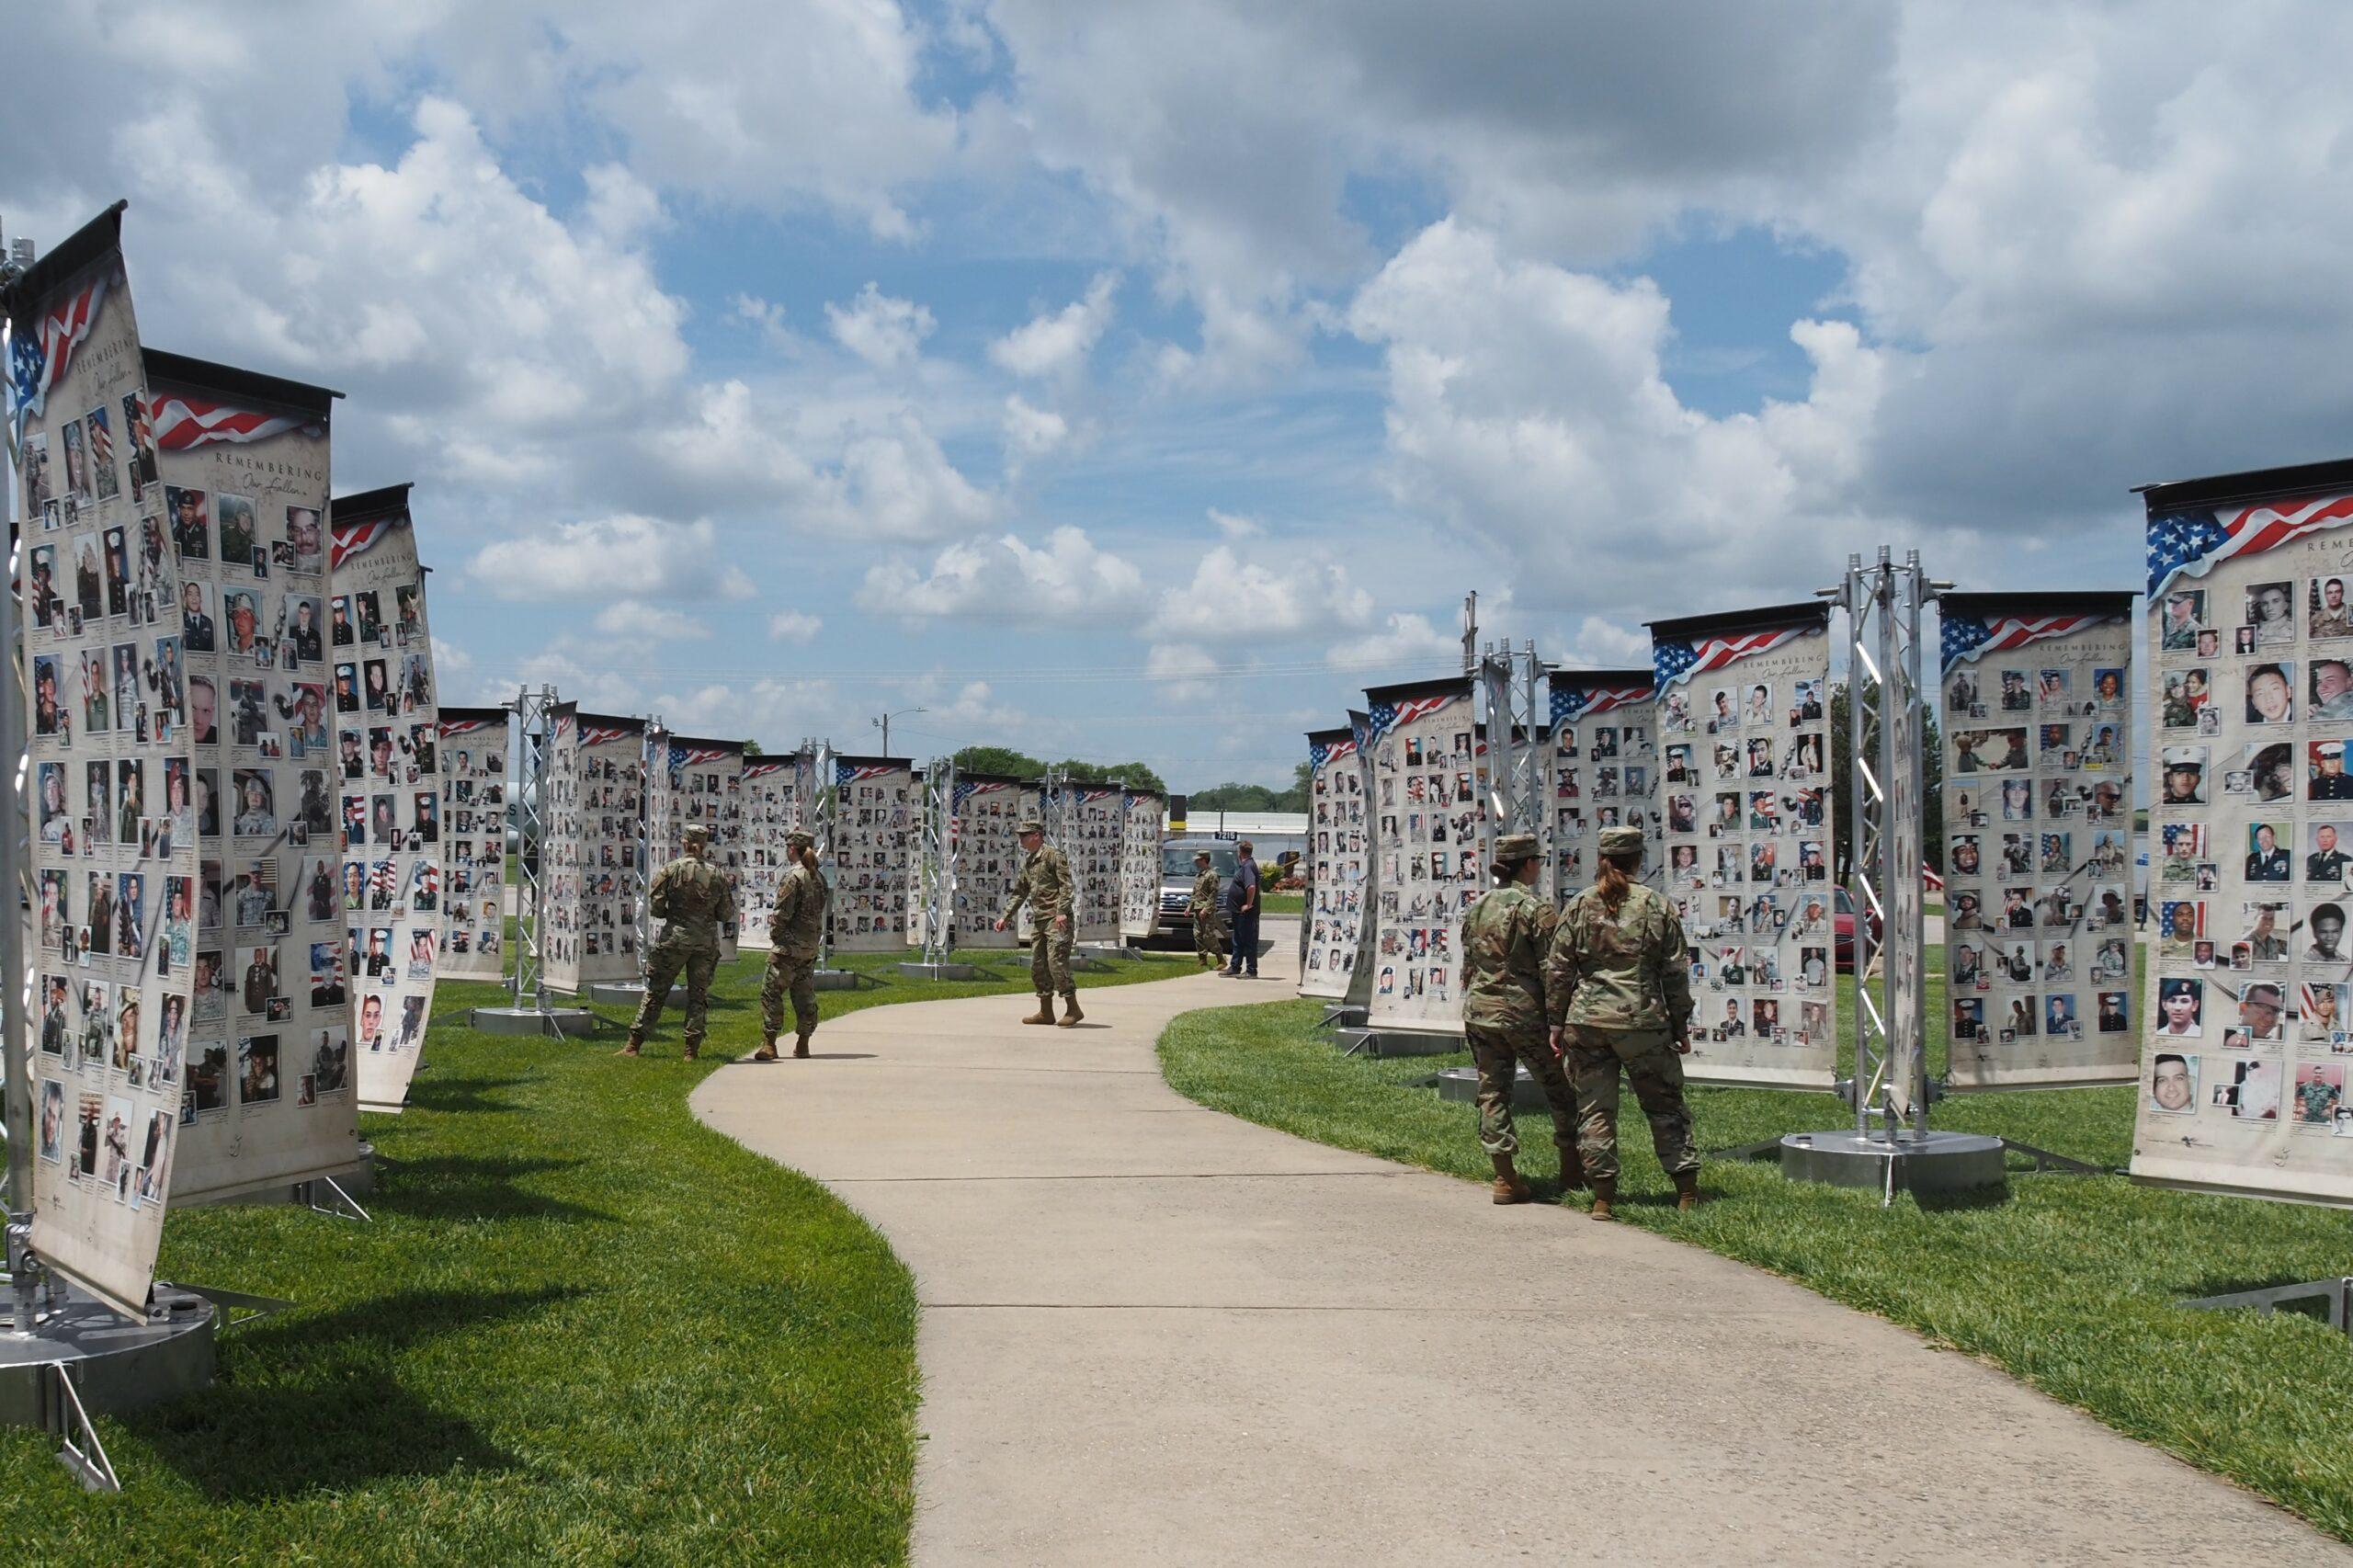 Traveling memorial honors fallen service members day after Kansas airman dies